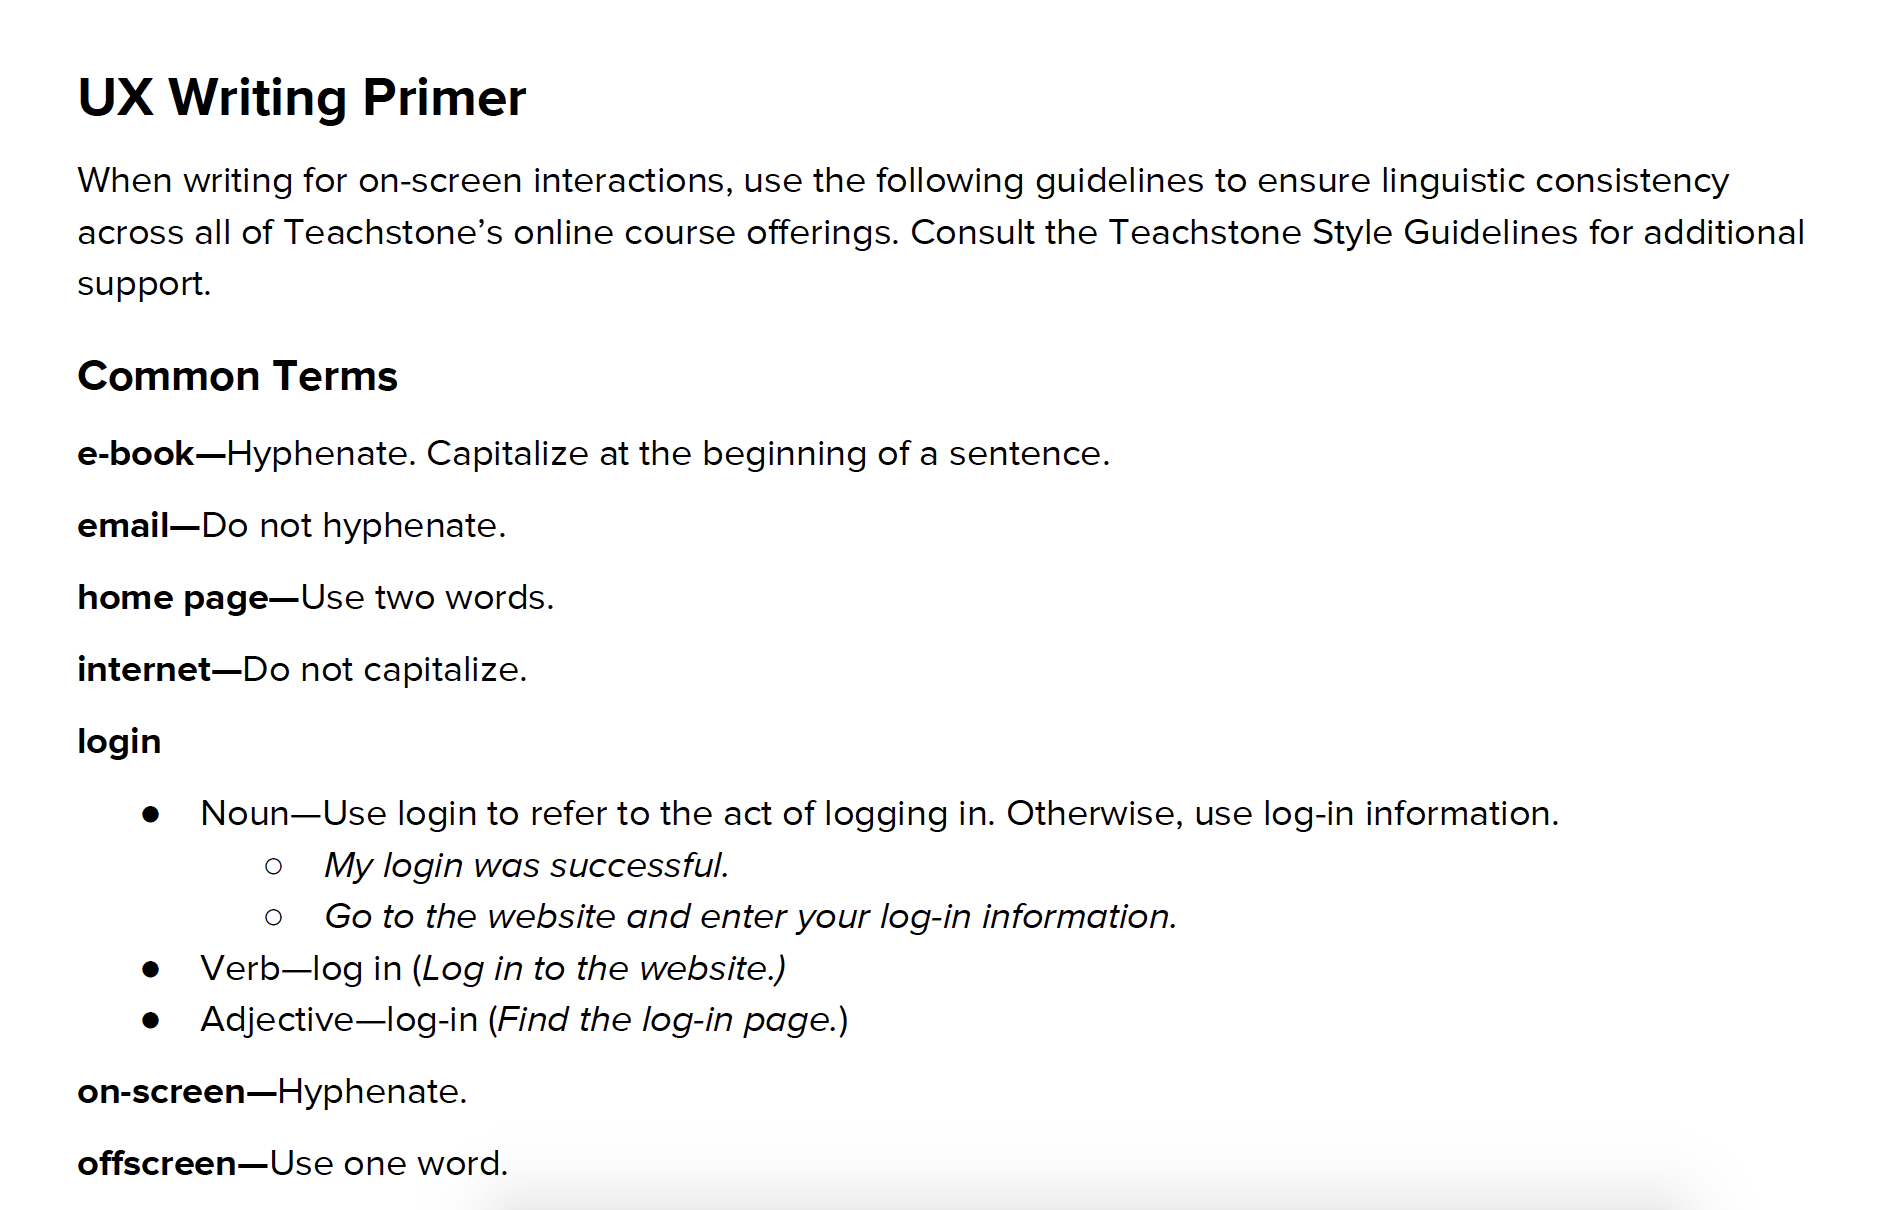 UX Writing Primer -